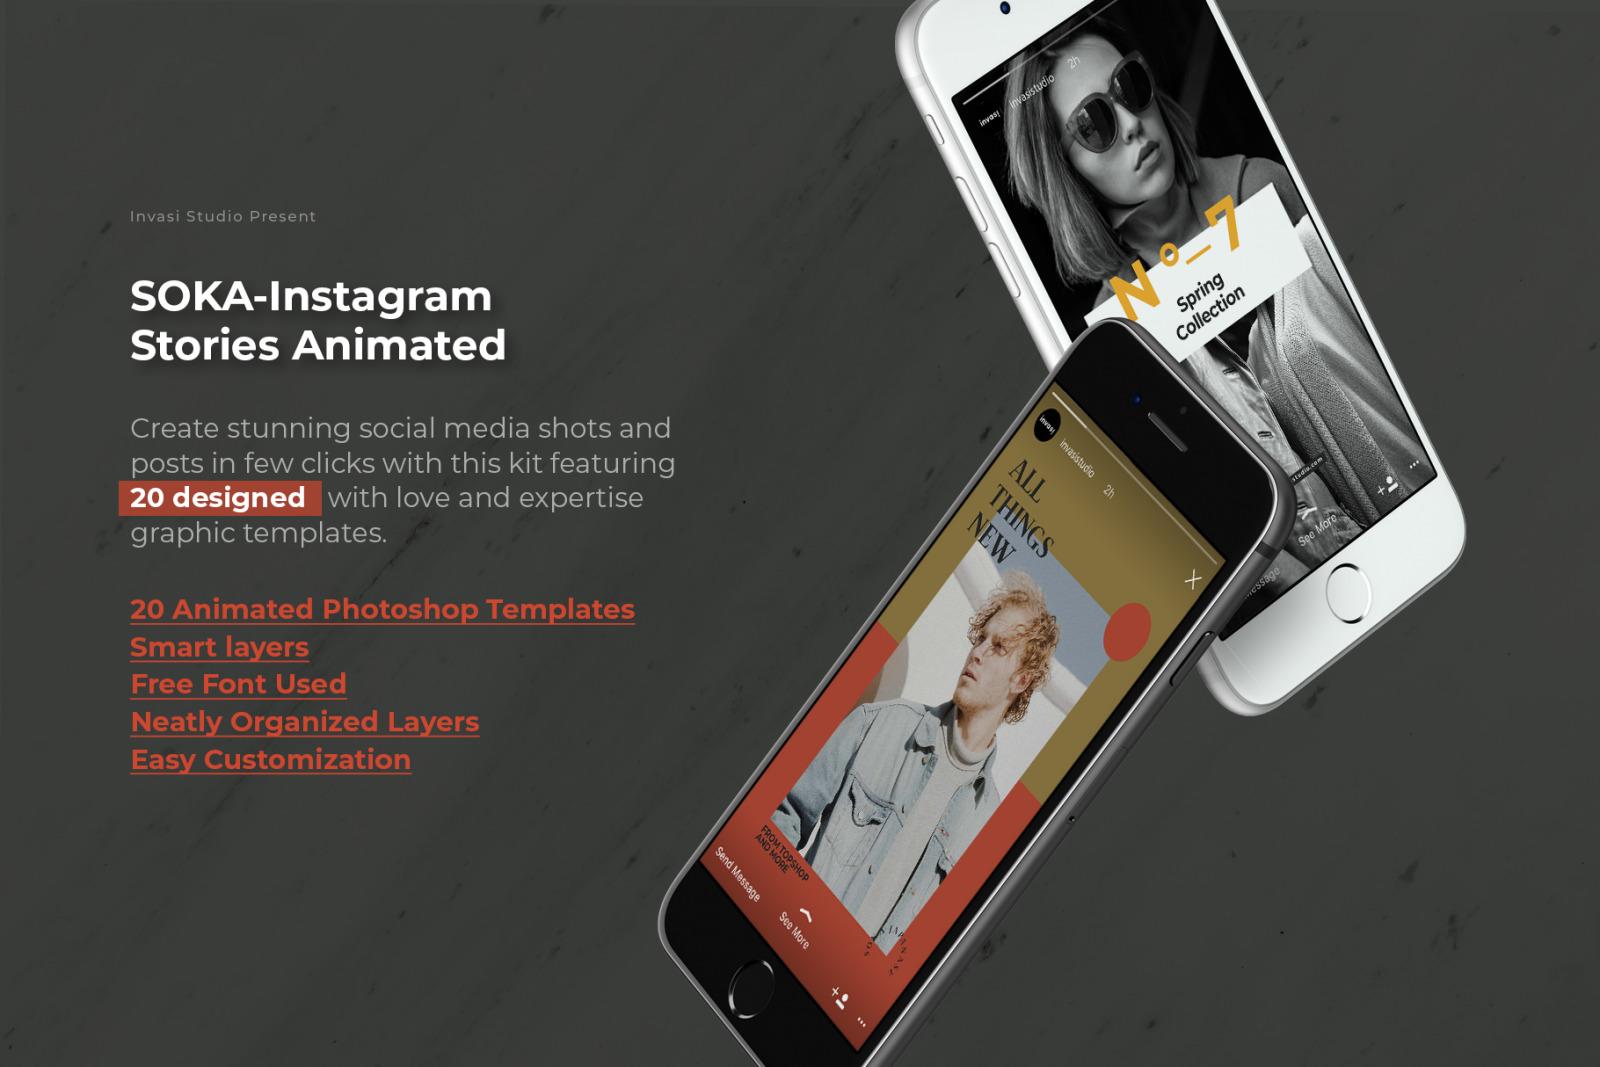 SOKA-Instagram Stories Animated